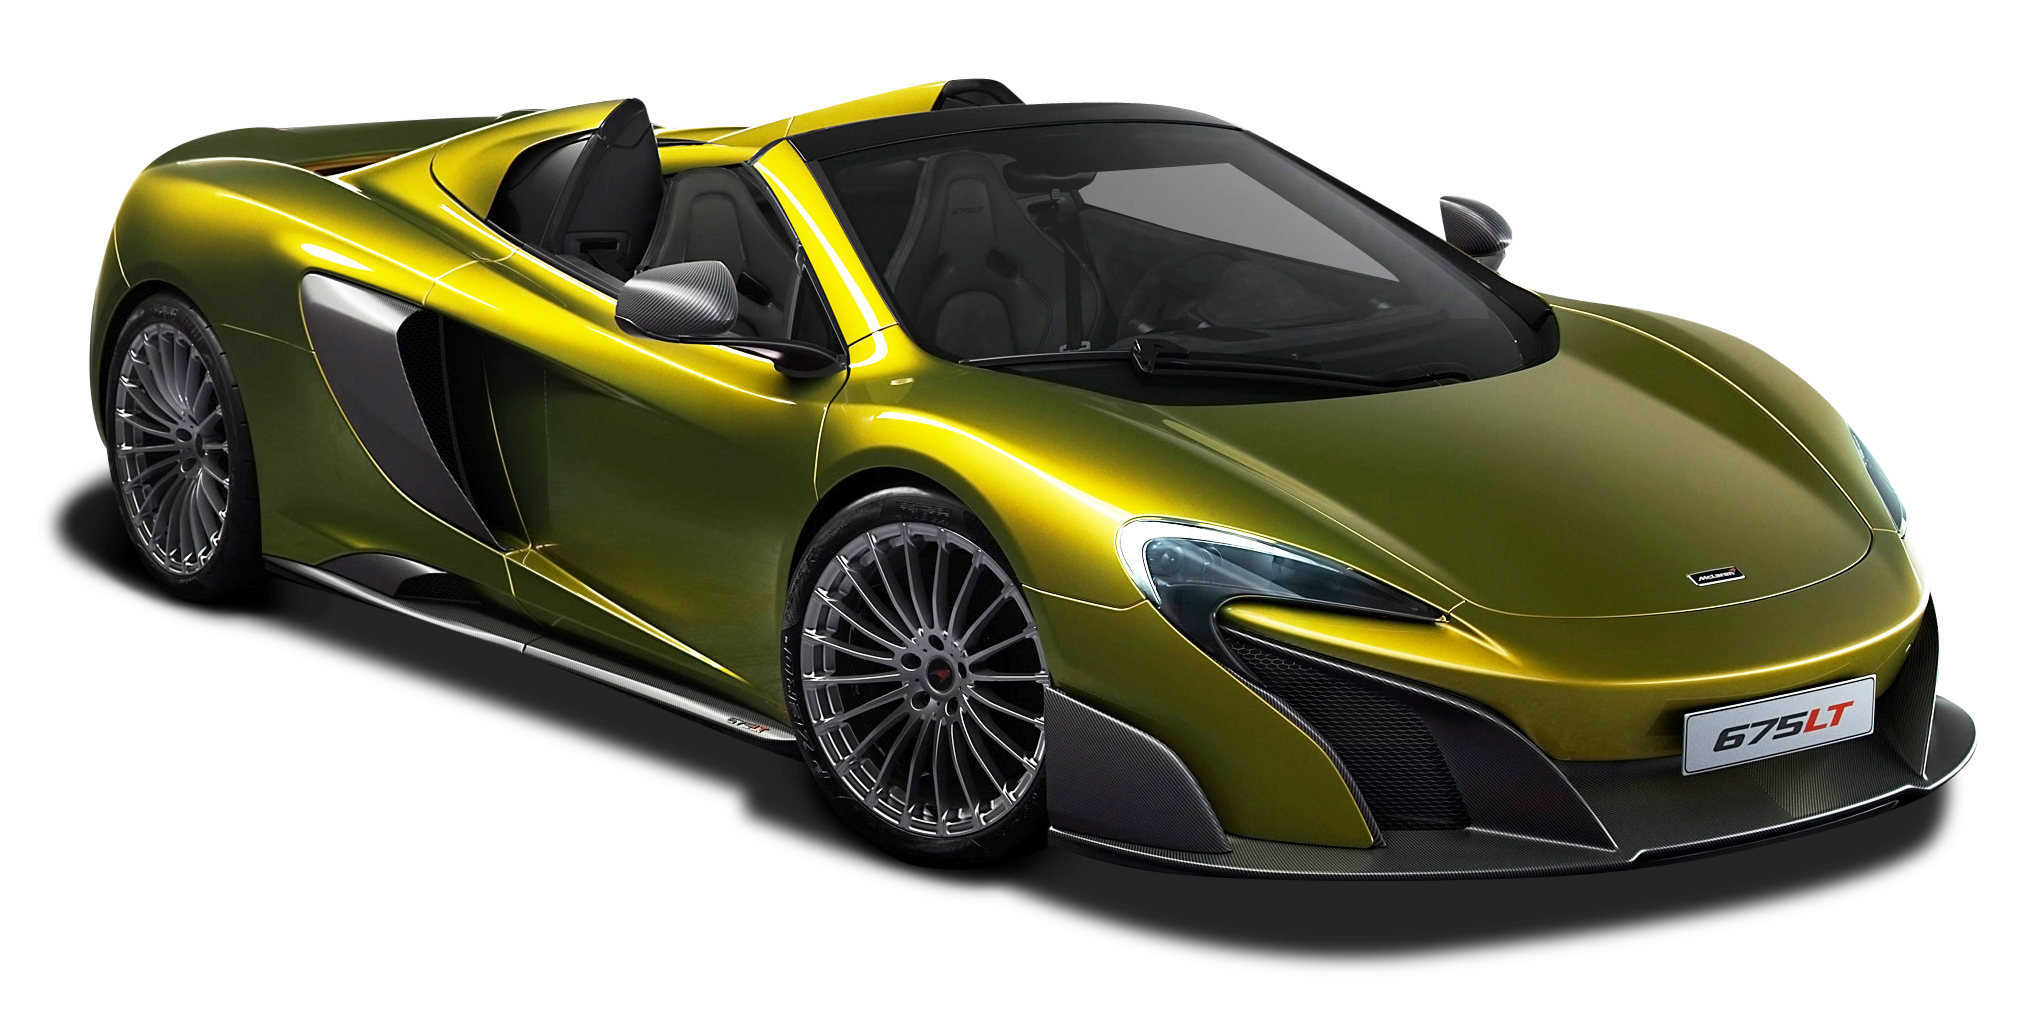 Green McLaren 675LT Spider Super Car